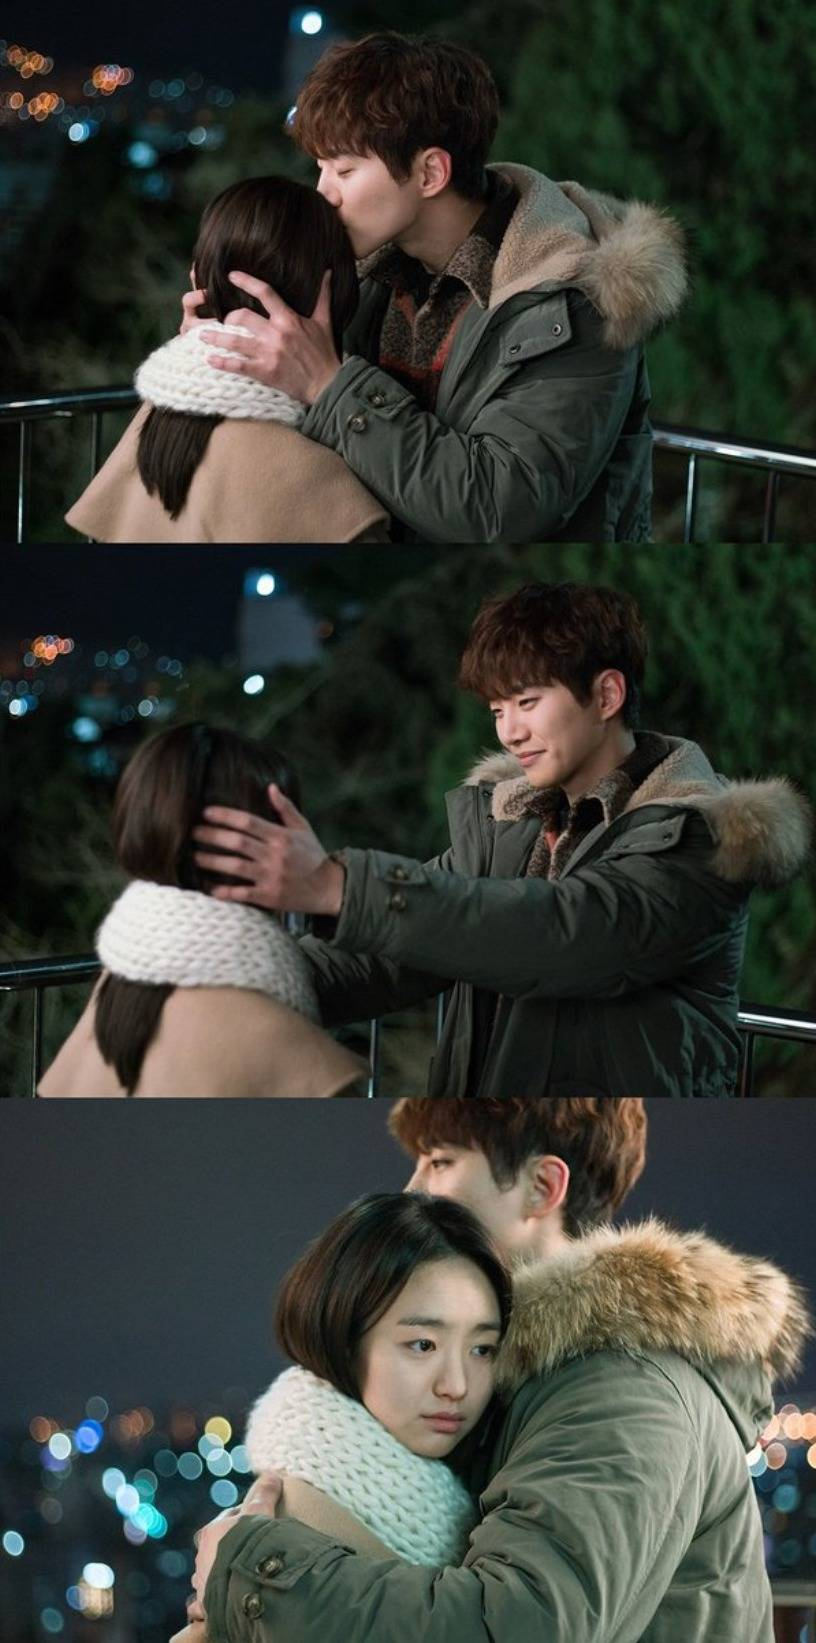 Spoiler] Added Episode 14 Captures for the Korean Drama